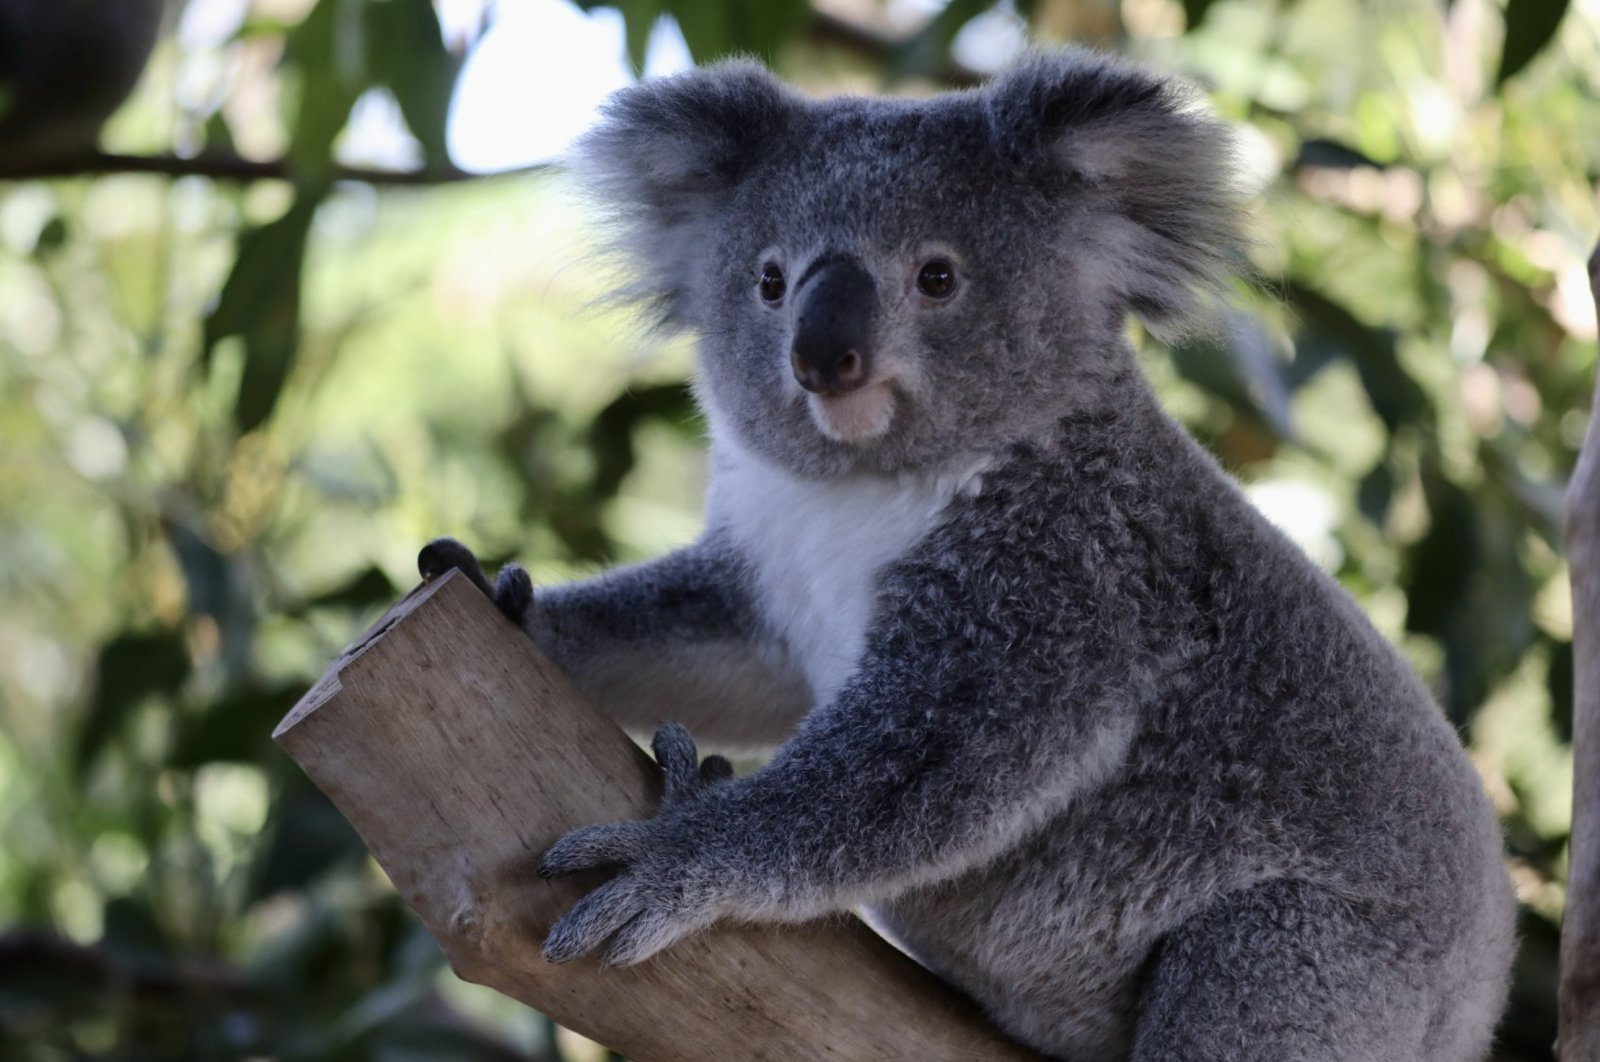 Elsa the koala at the Australian Zoo on June 10, 2020. (Reuters Photo)